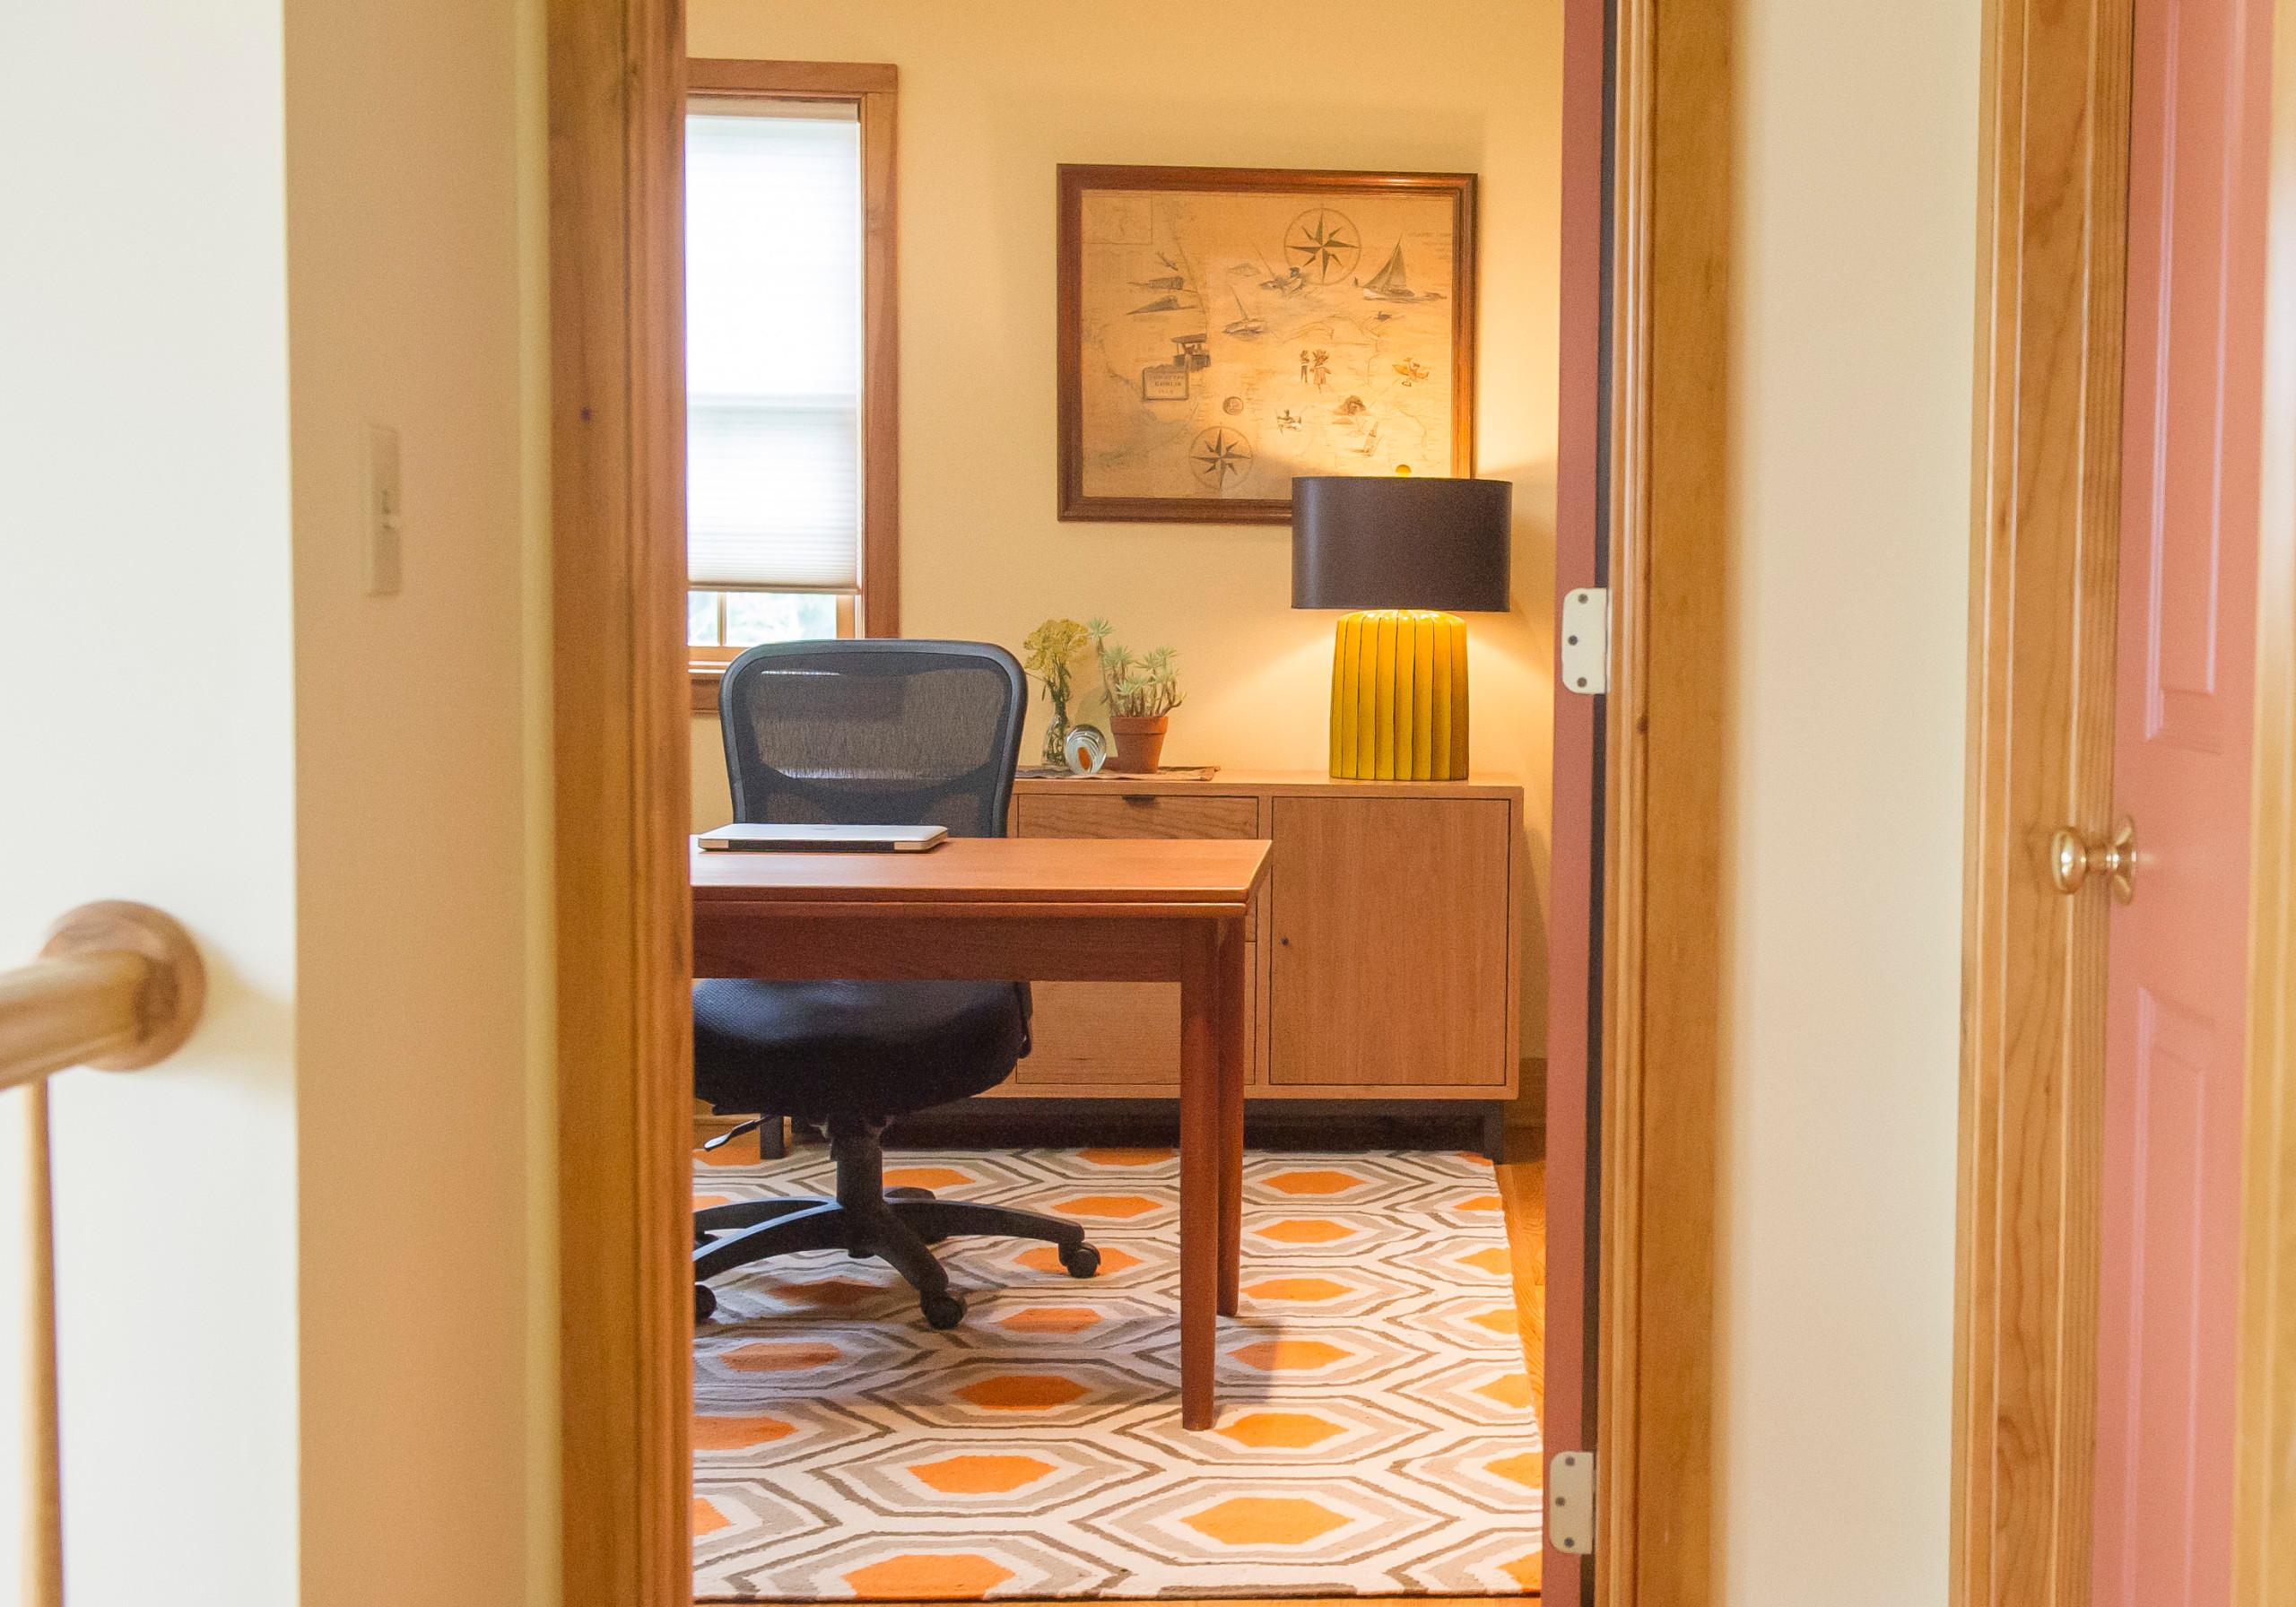 Chatham, NY Home Office